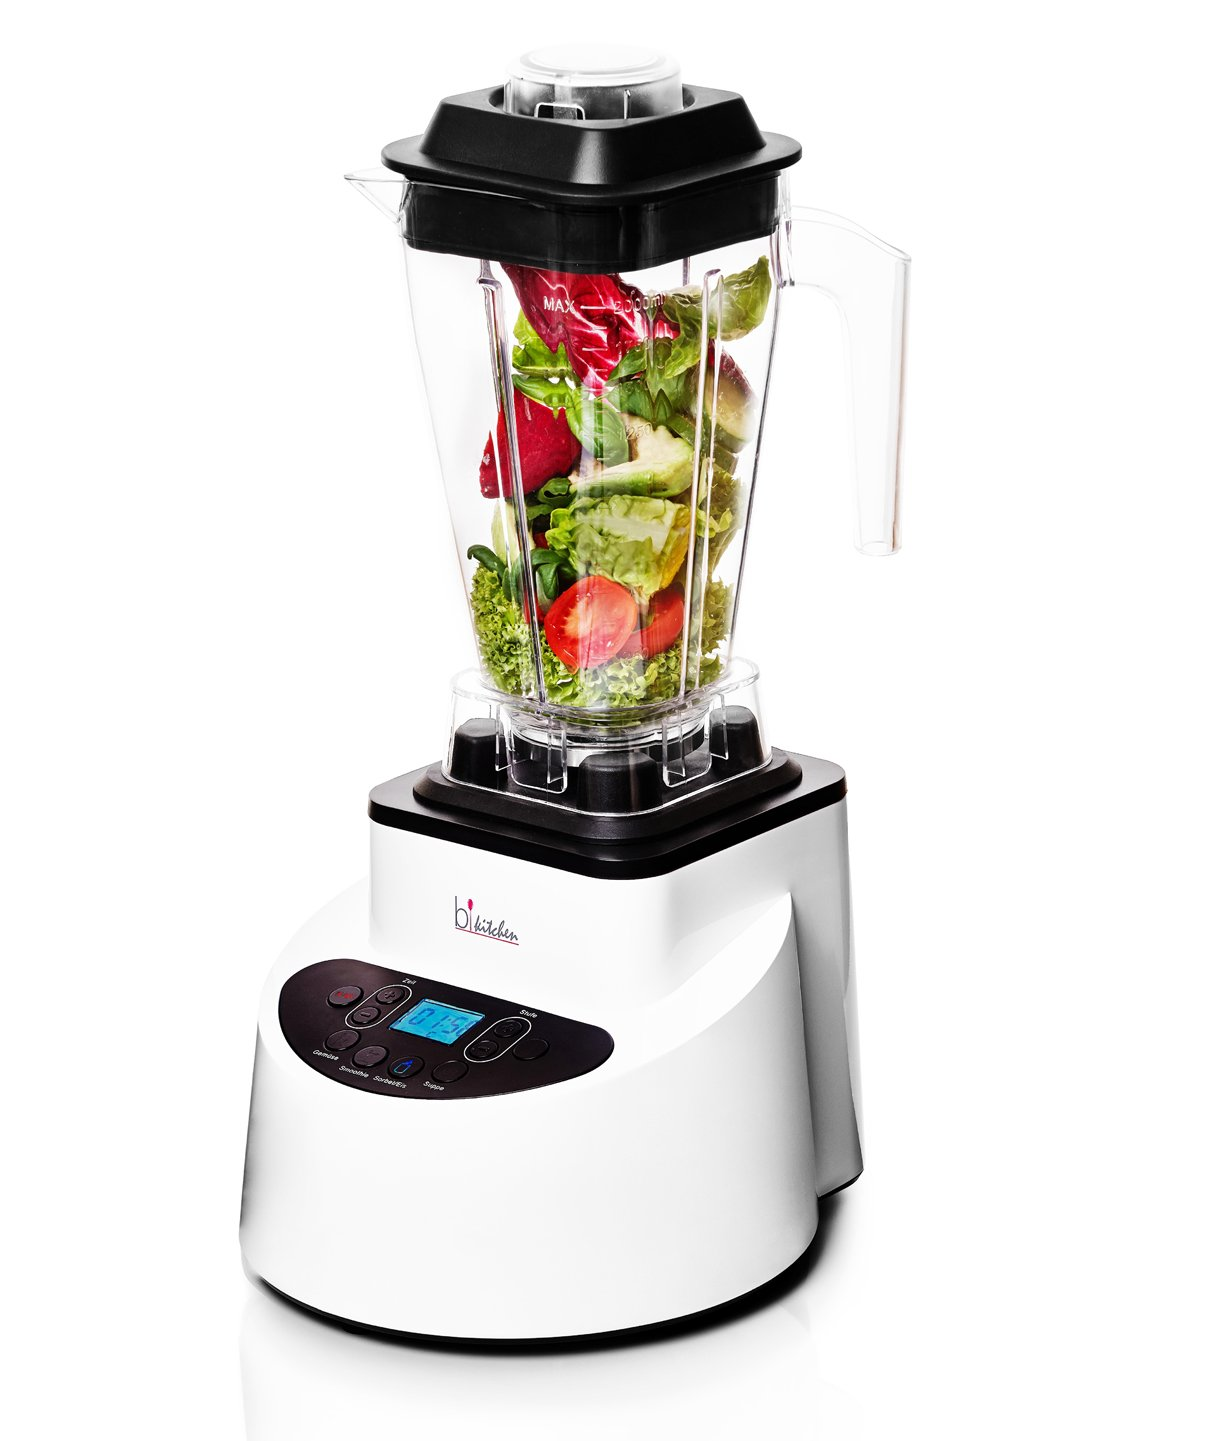 Silva Schneider Smooth-320 Vitamin Mixer con Función Intermitente ...